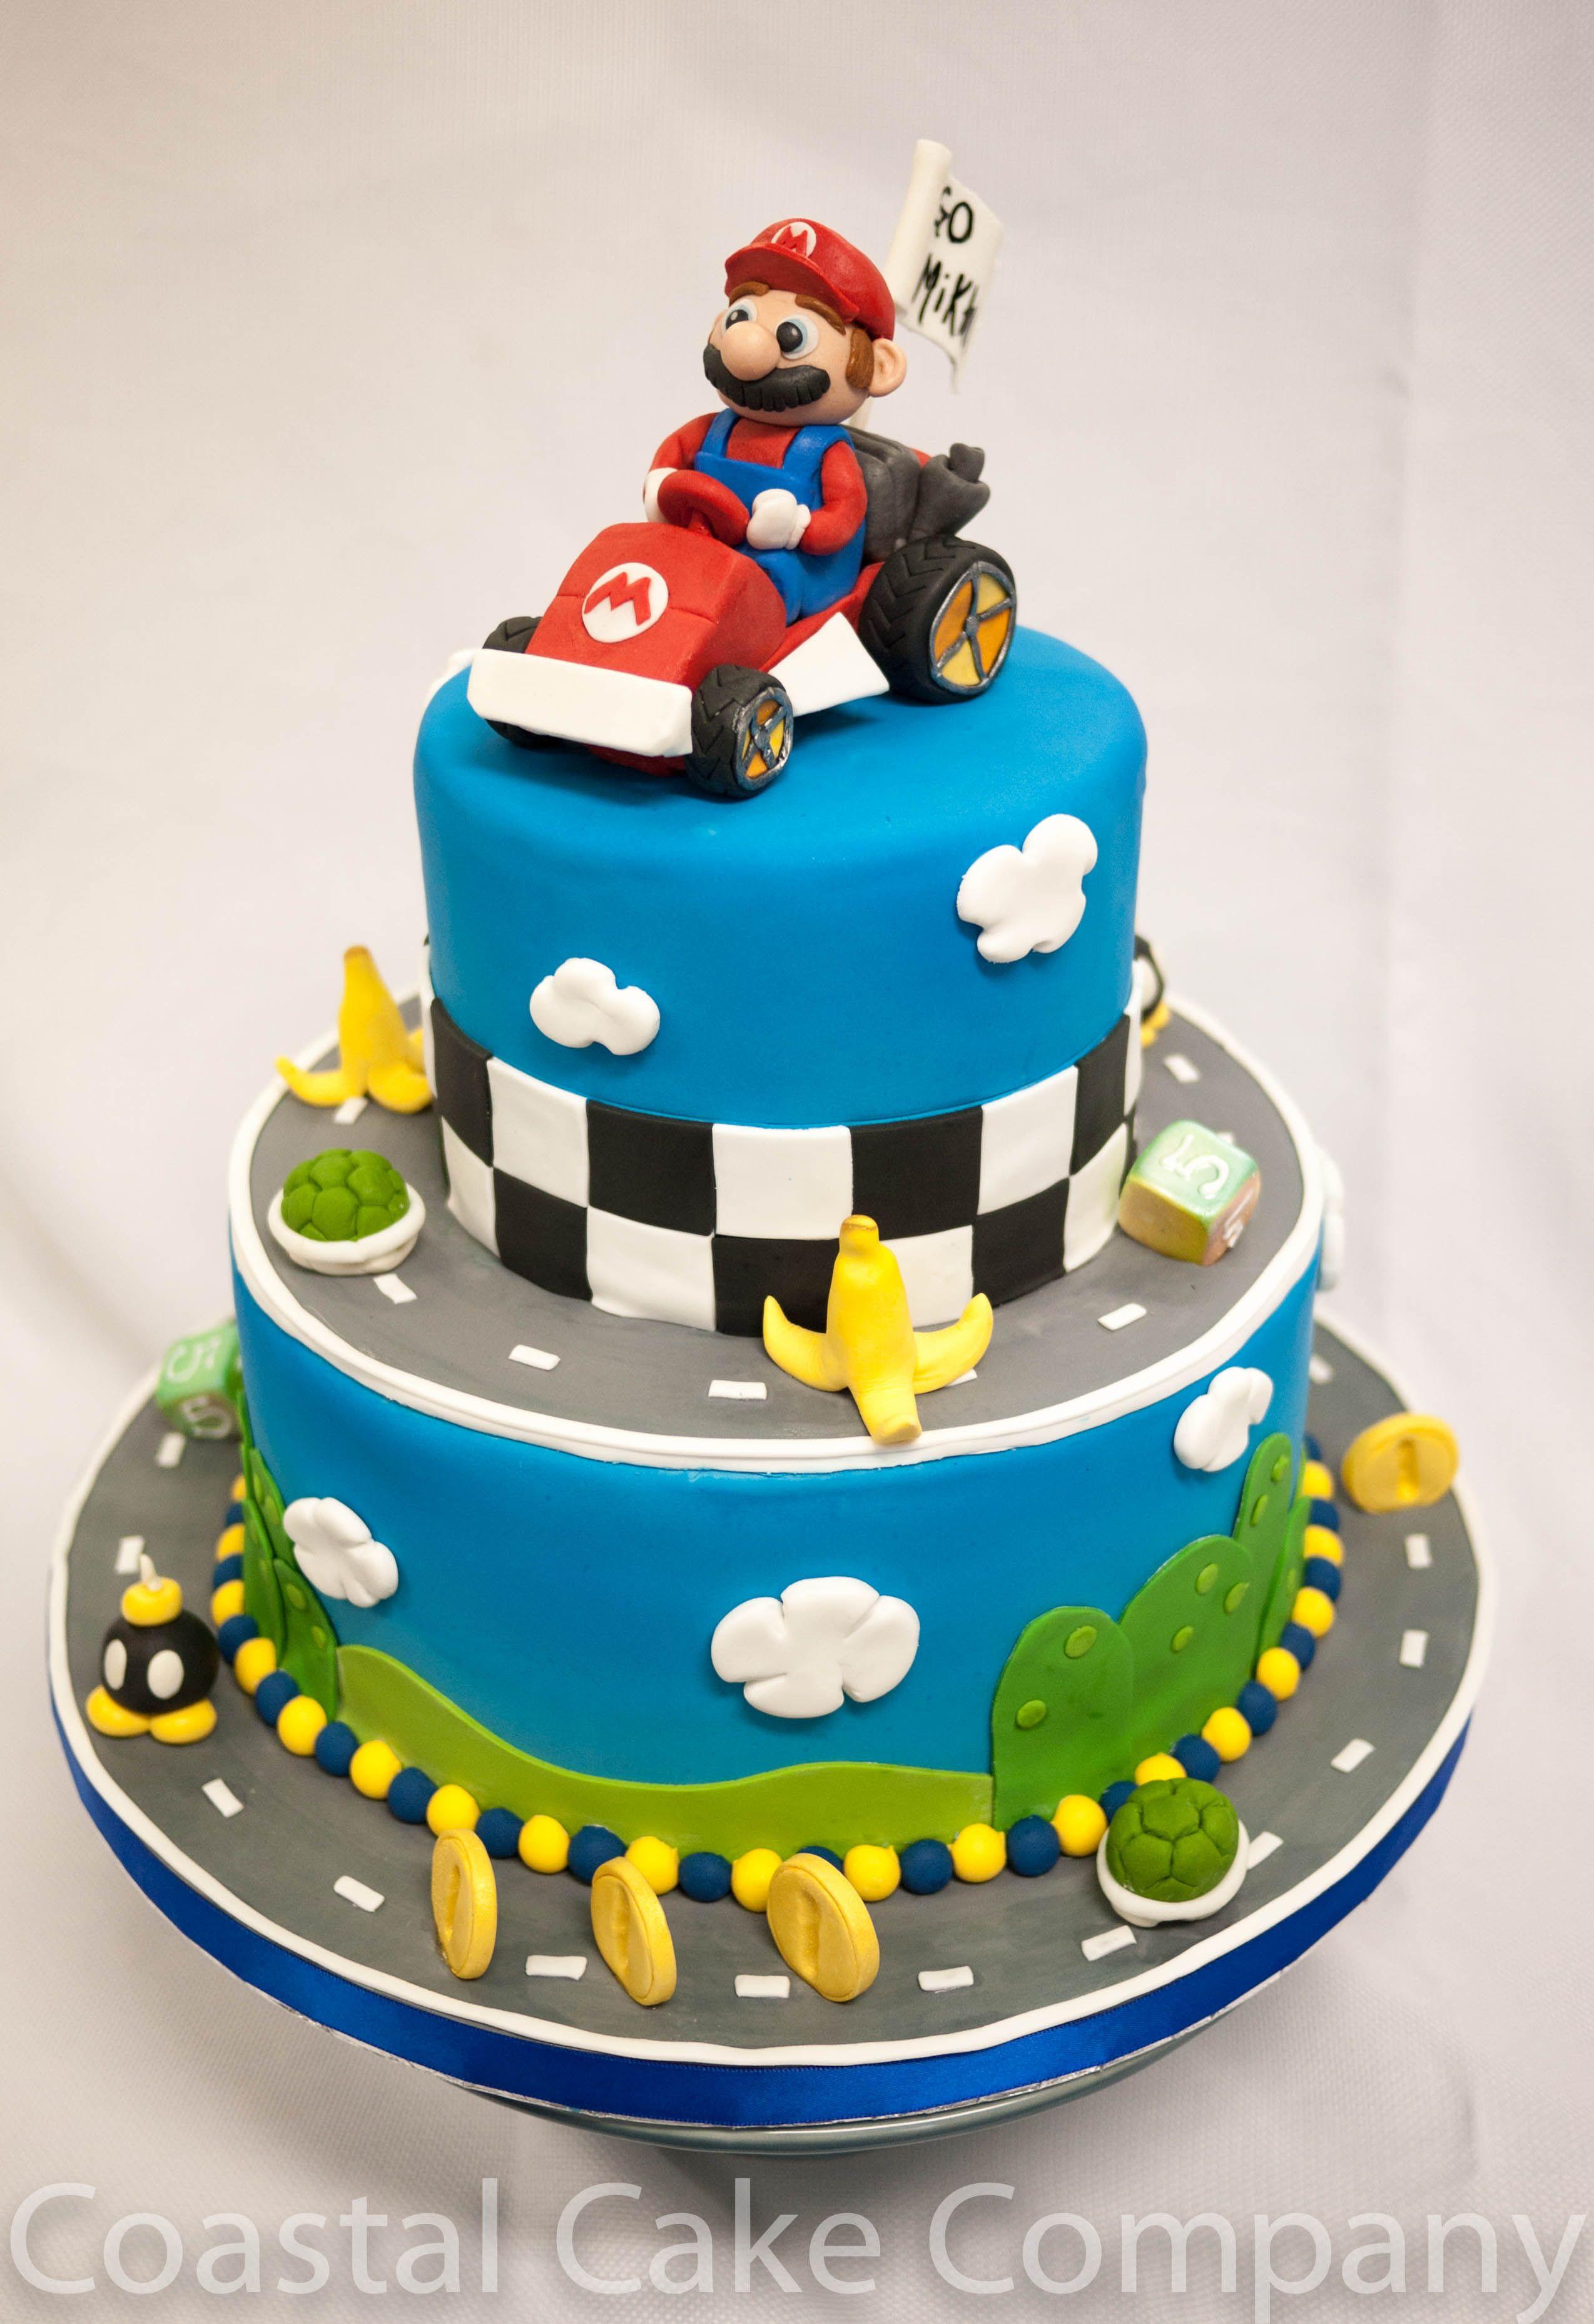 Go Kart Birthday Cake Designs